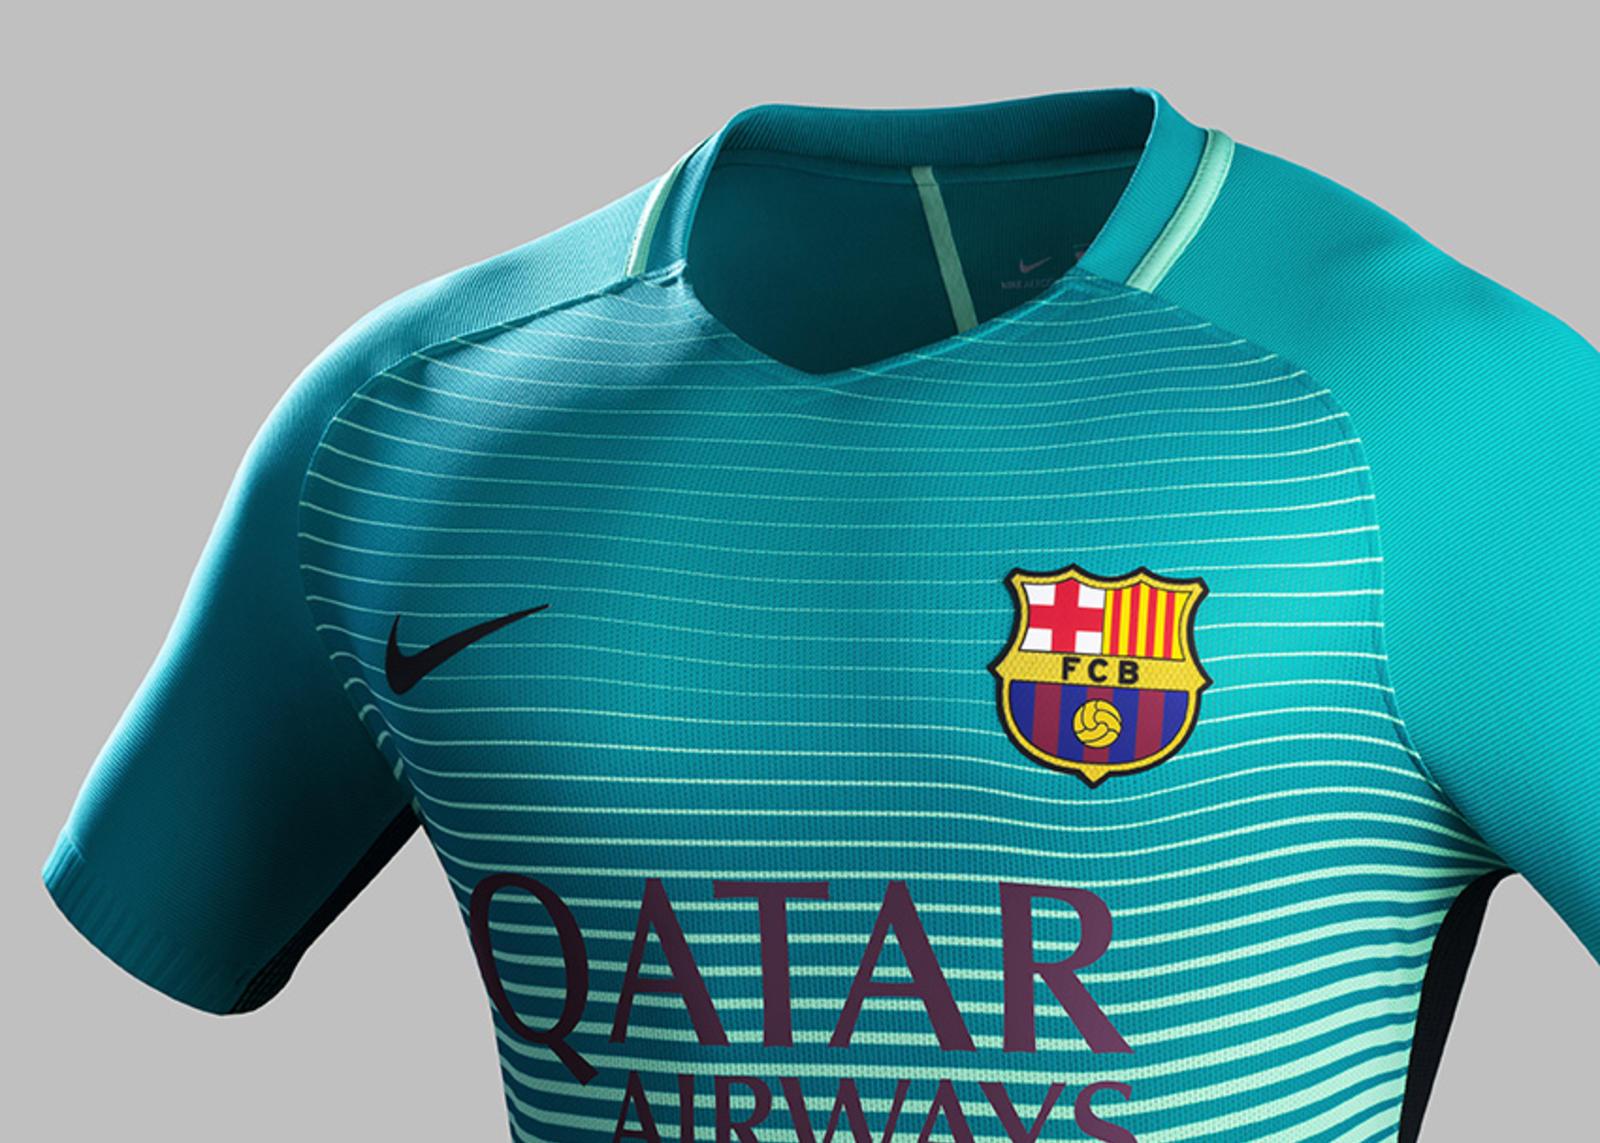 F.C. Barcelona third kit